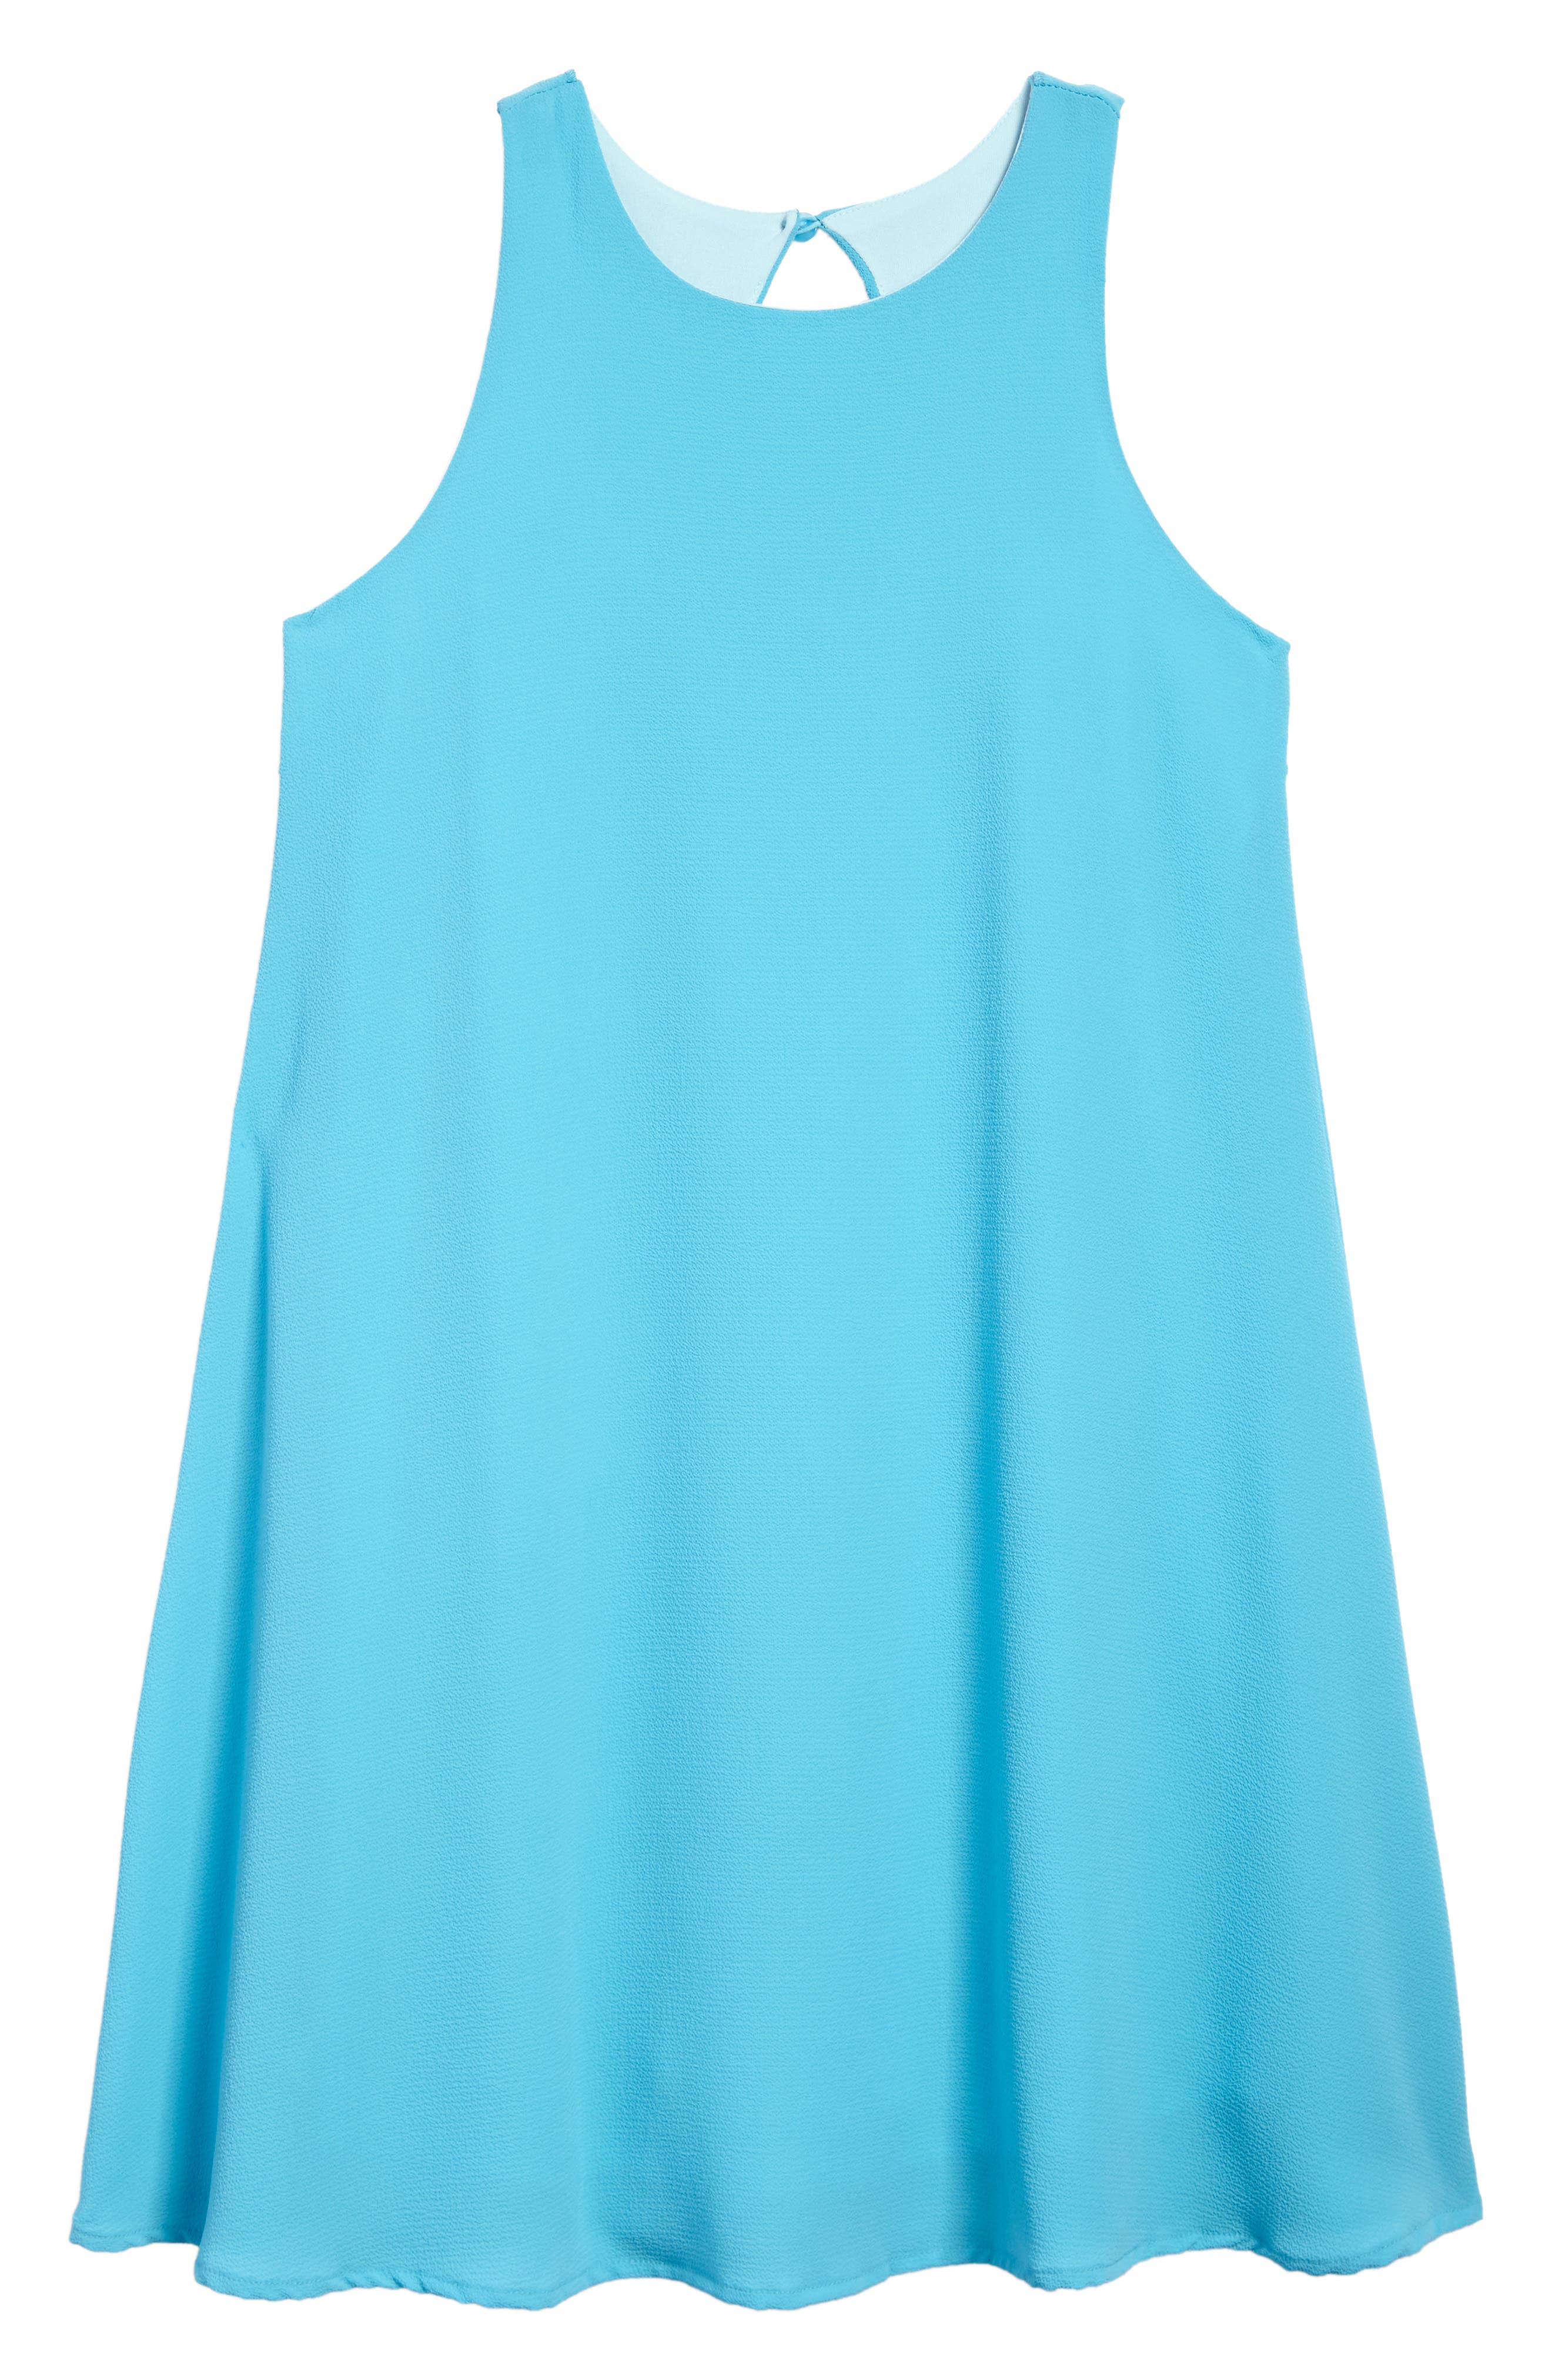 Ruffle Trapeze Dress,                         Main,                         color, 430